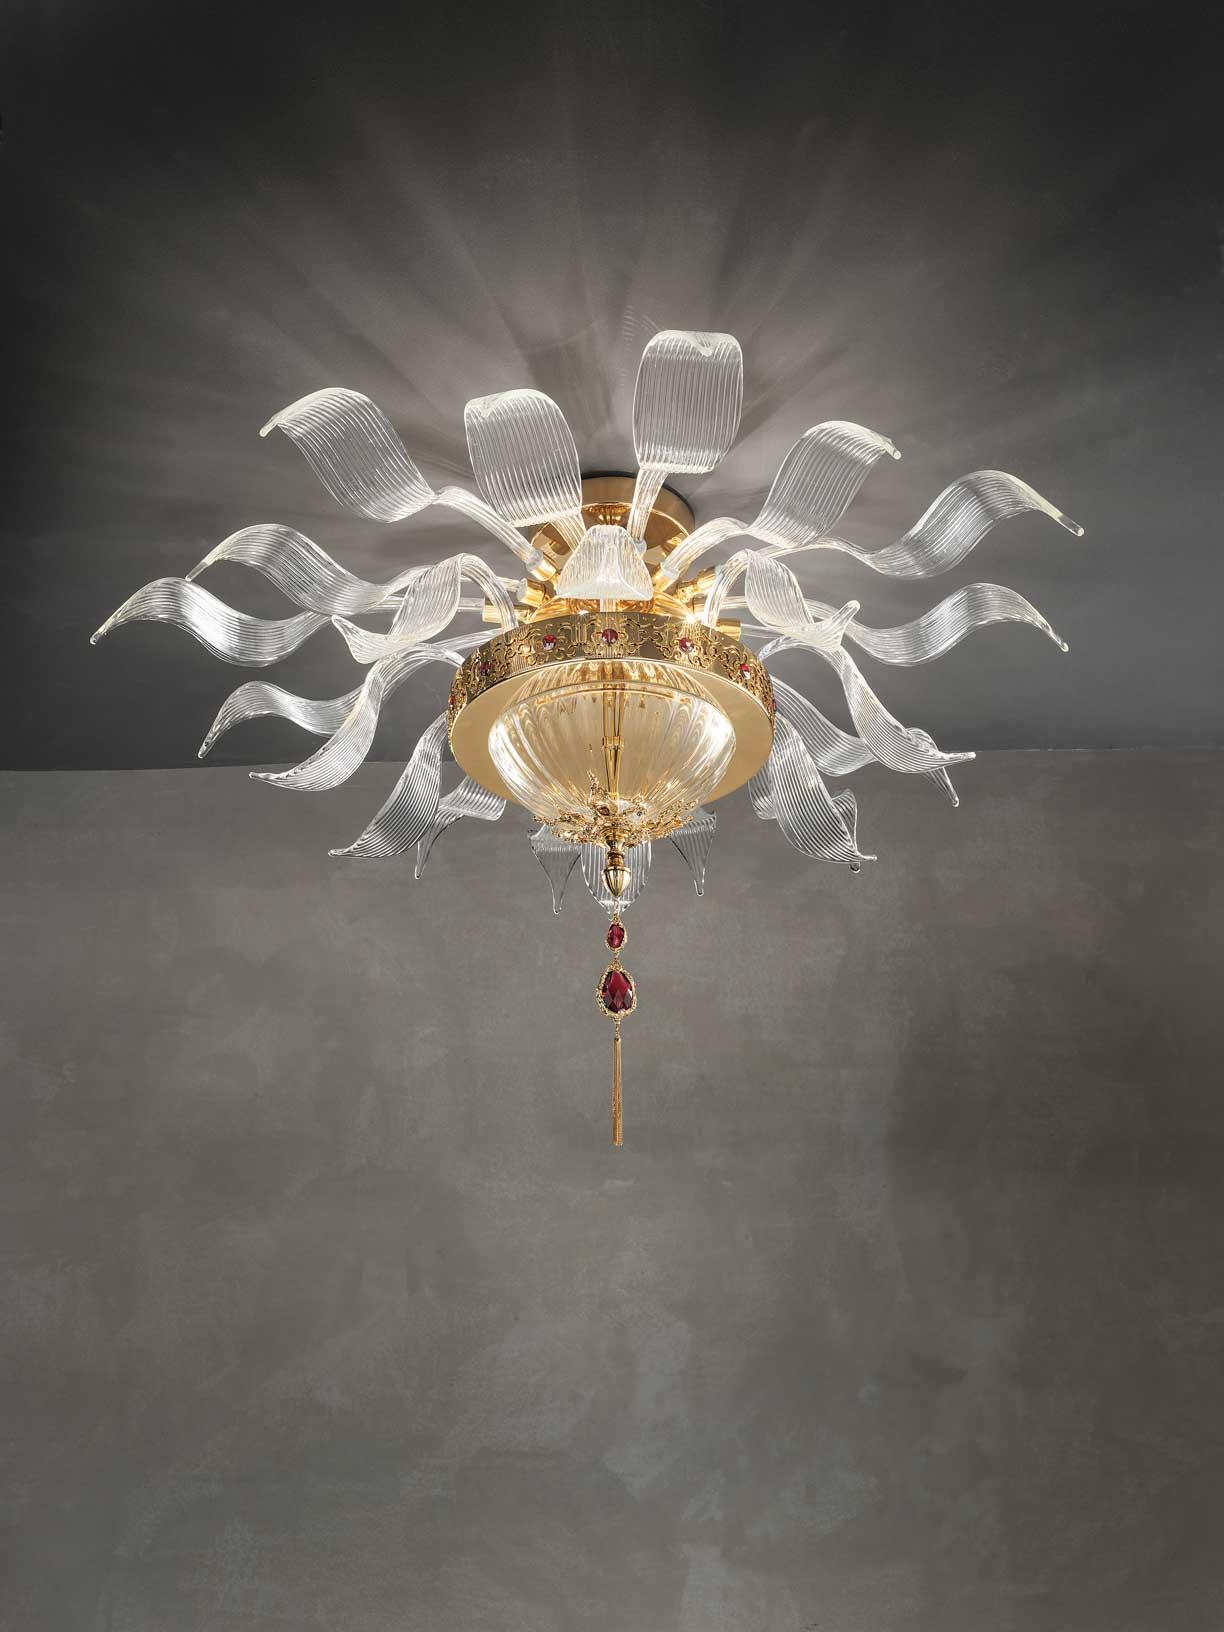 Euroluce Lampadari Люстра Julienne потолочная (прозрачный, дымчатый, зеркальный, янтарный)